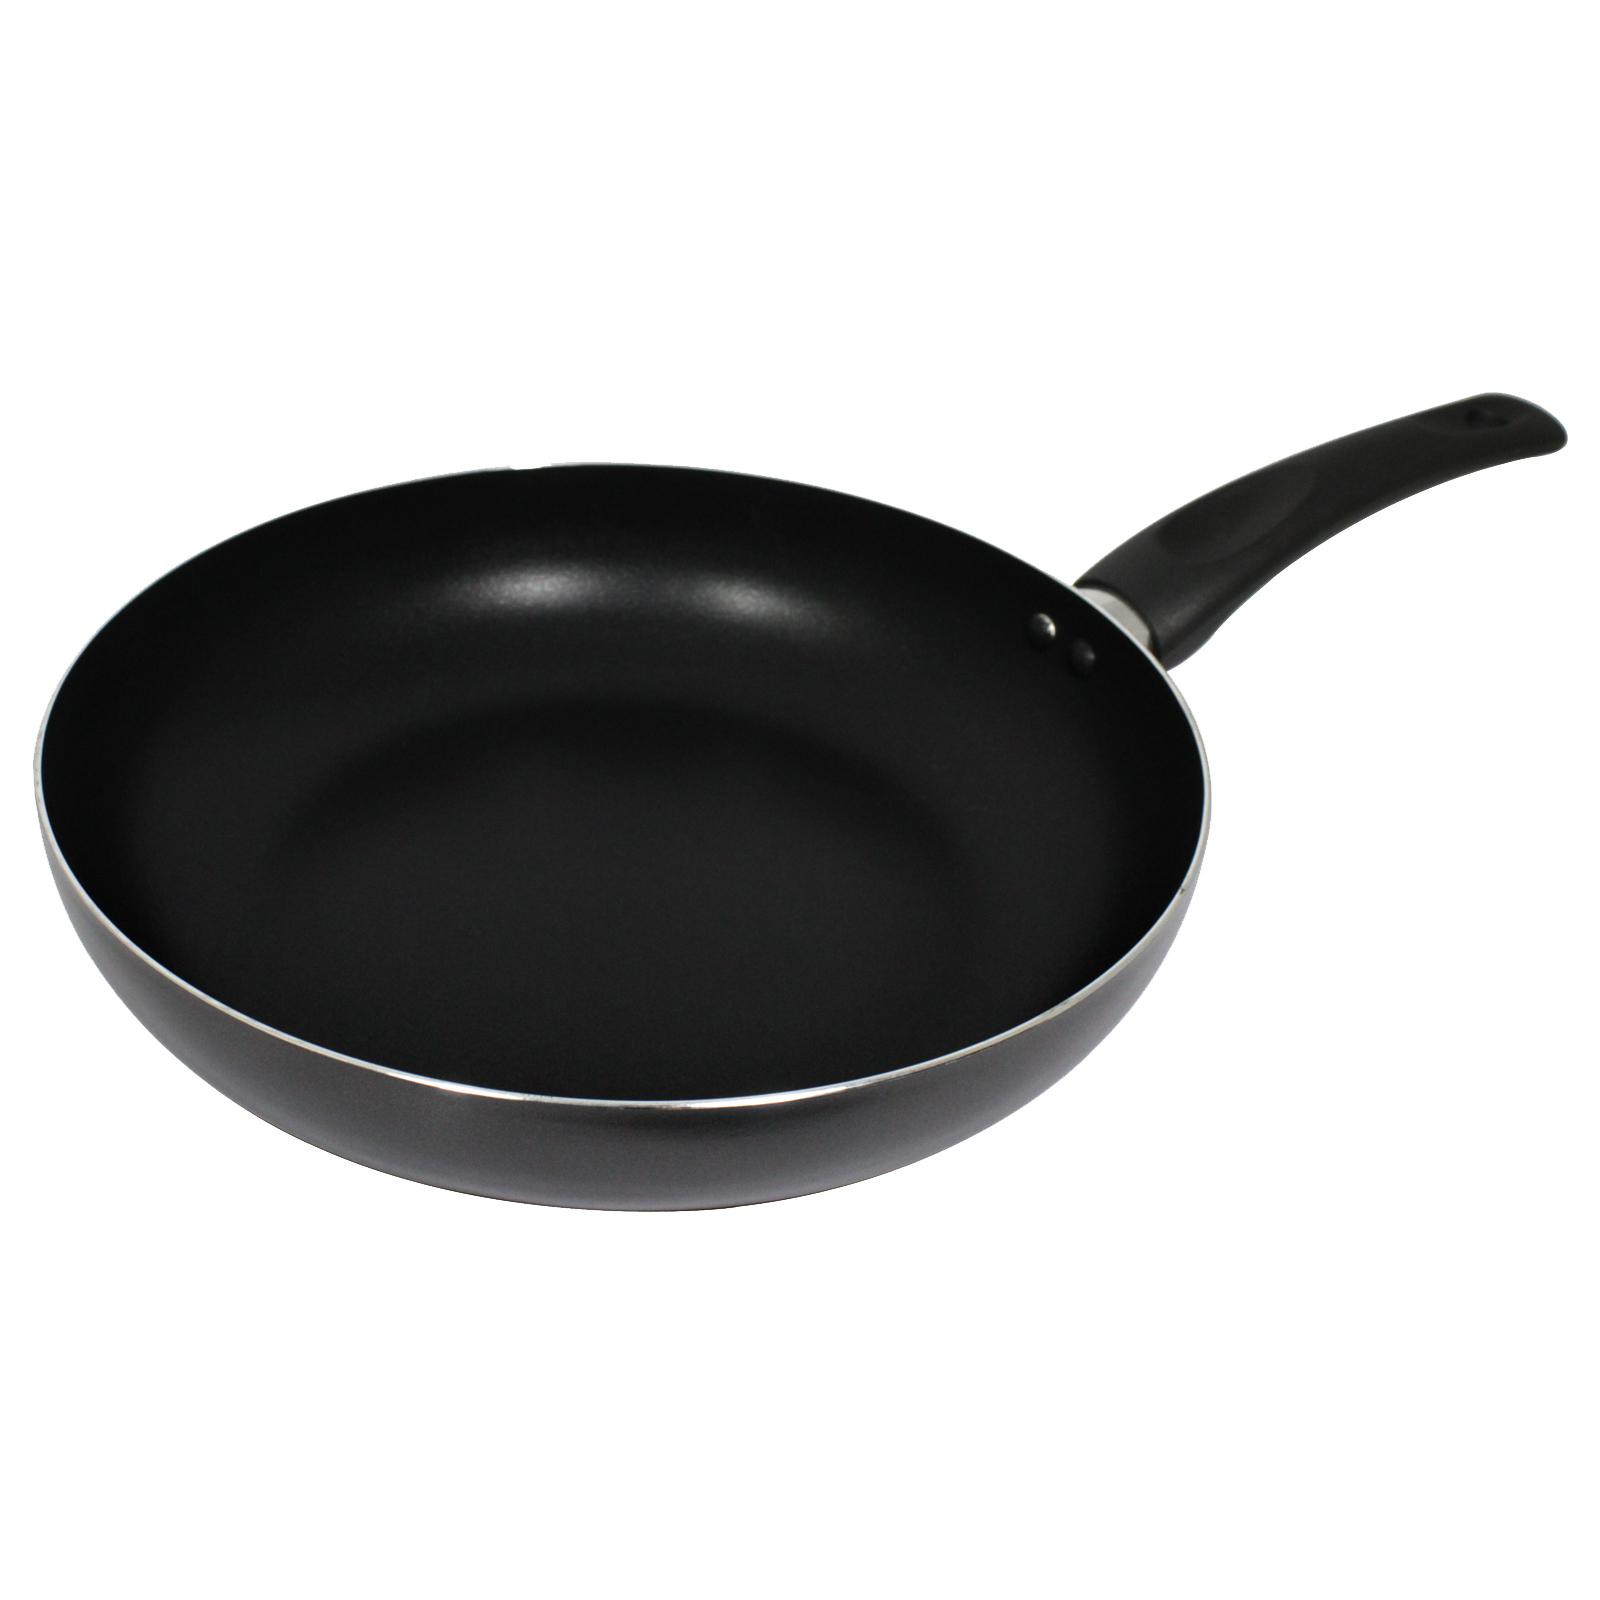 SAPPHIRE 11 NON-STICK FRYING PAN